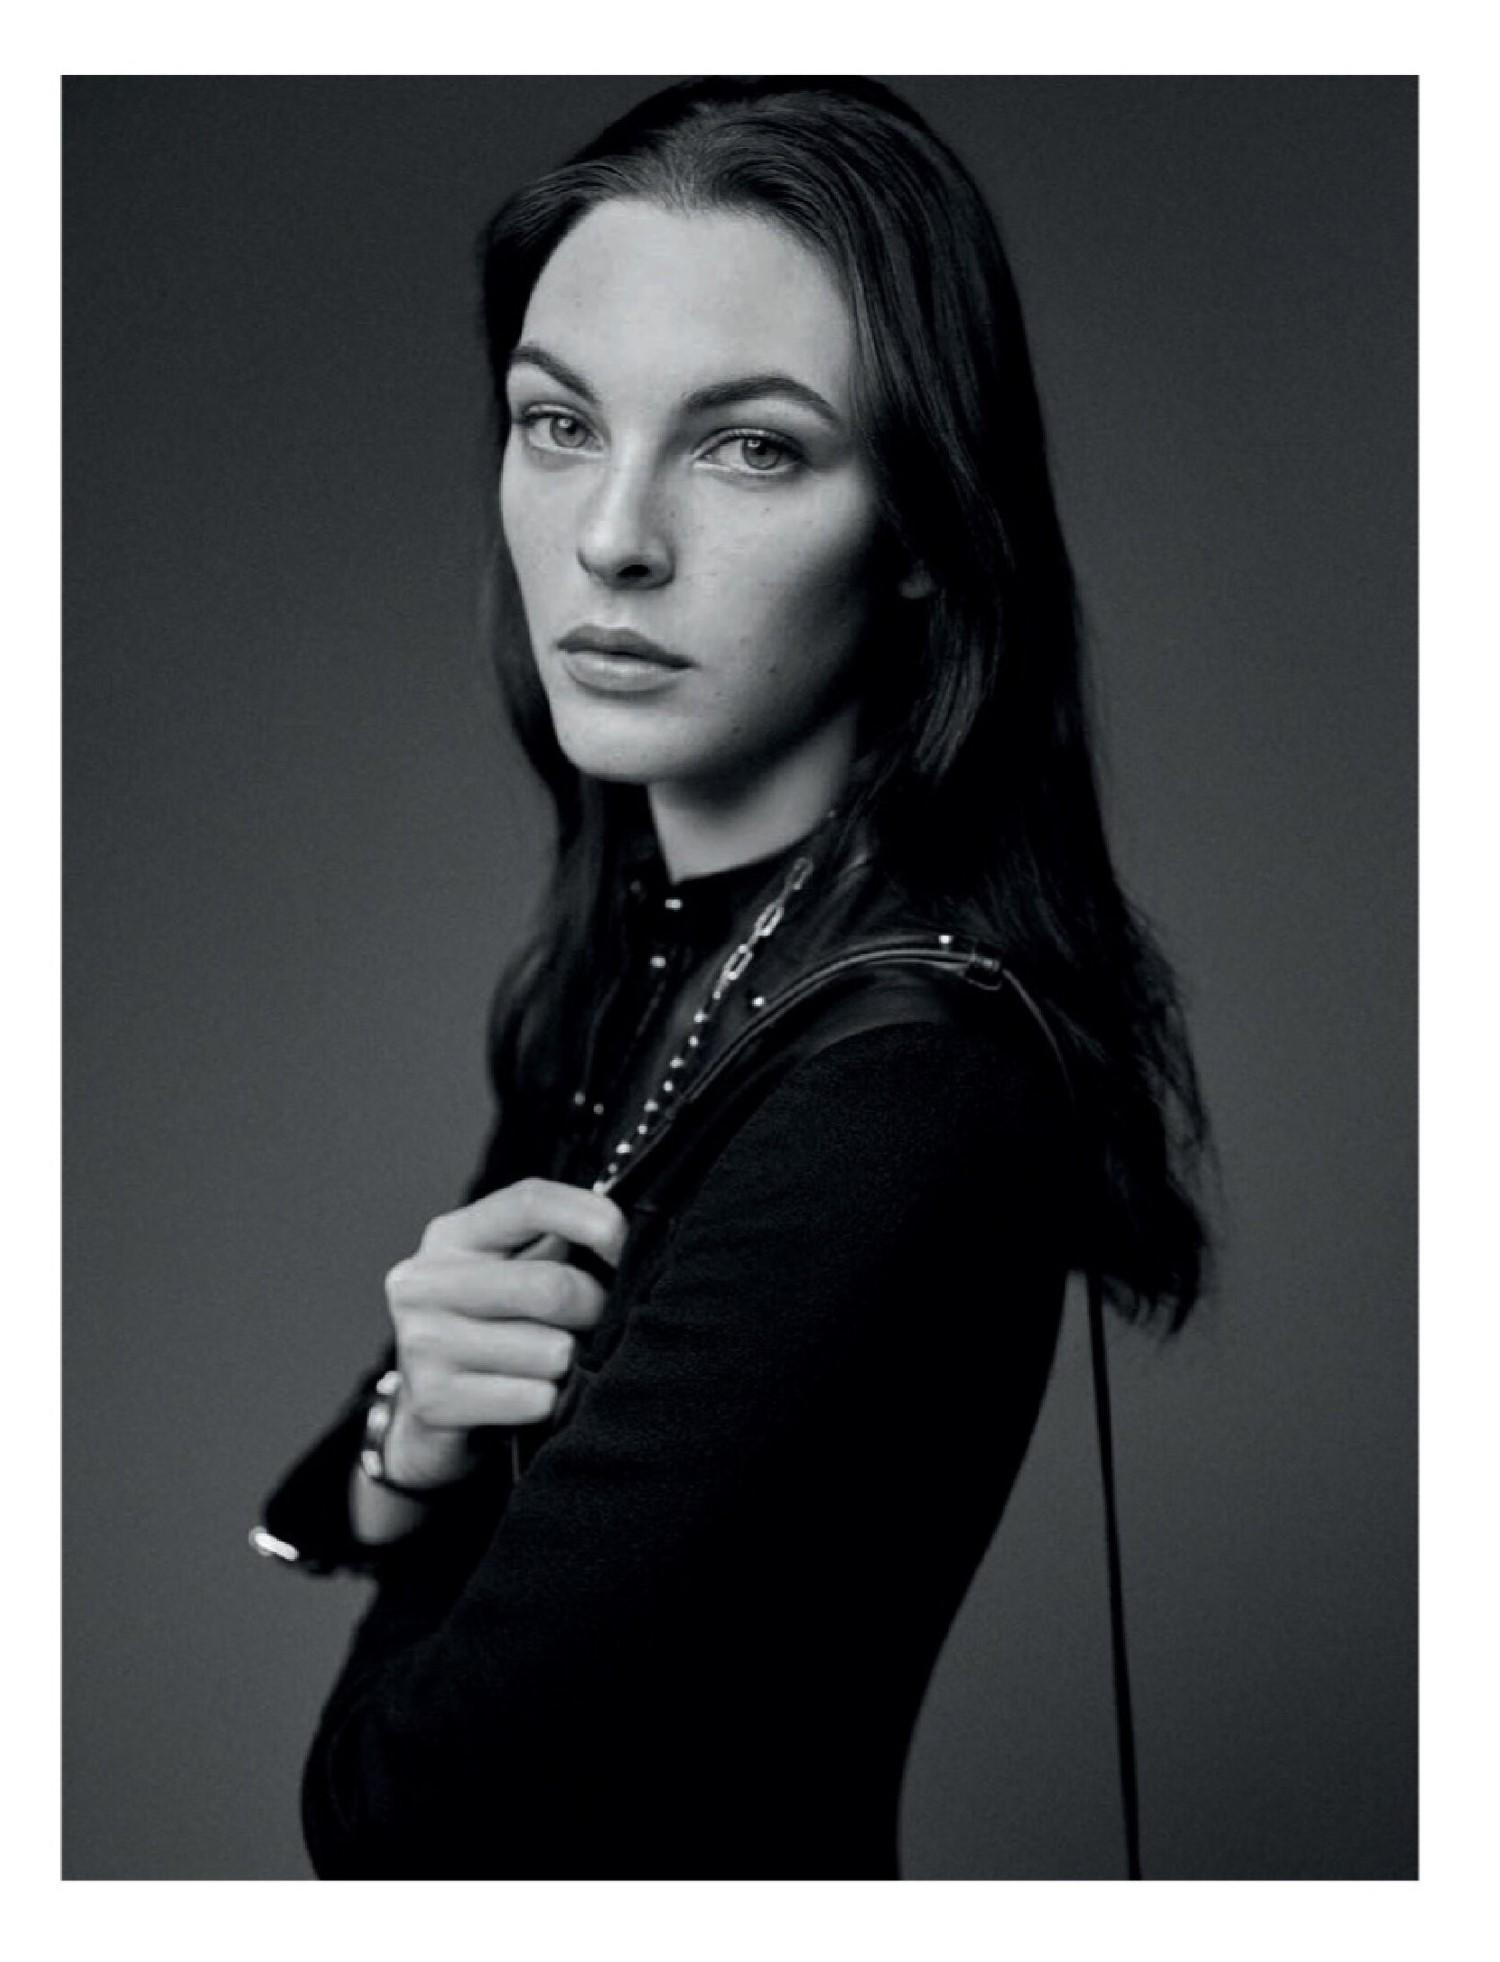 Vittoria Ceretti by Giampaolo Sgura for Vogue Paris Sept 2019 (5).jpg